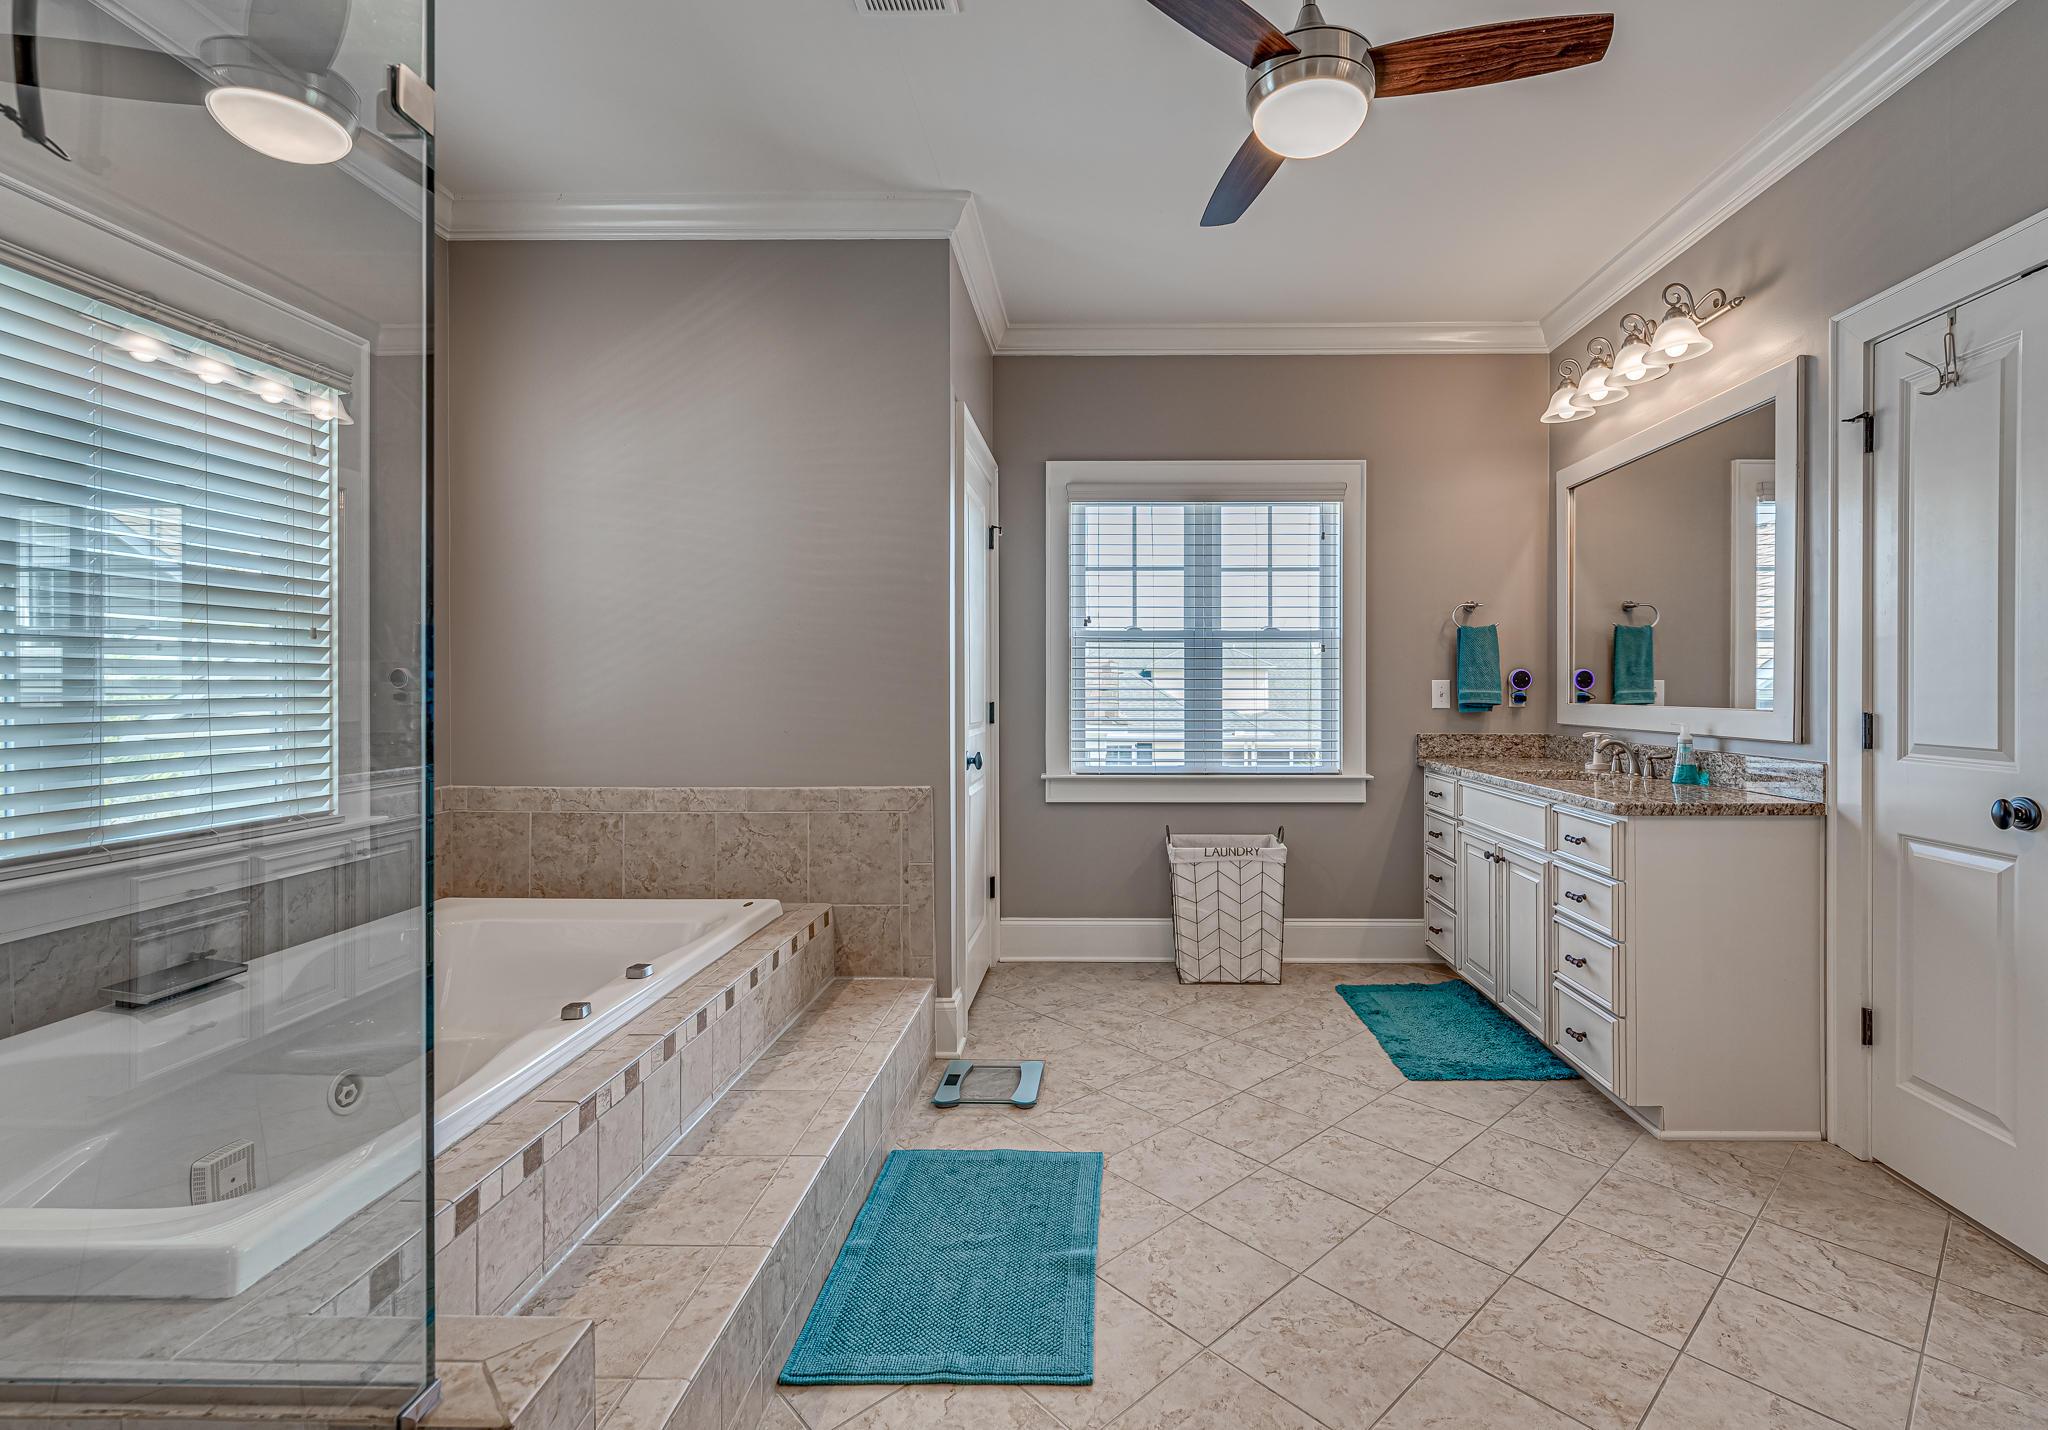 Daniel Island Smythe Park Homes For Sale - 1410 Wando View, Charleston, SC - 56